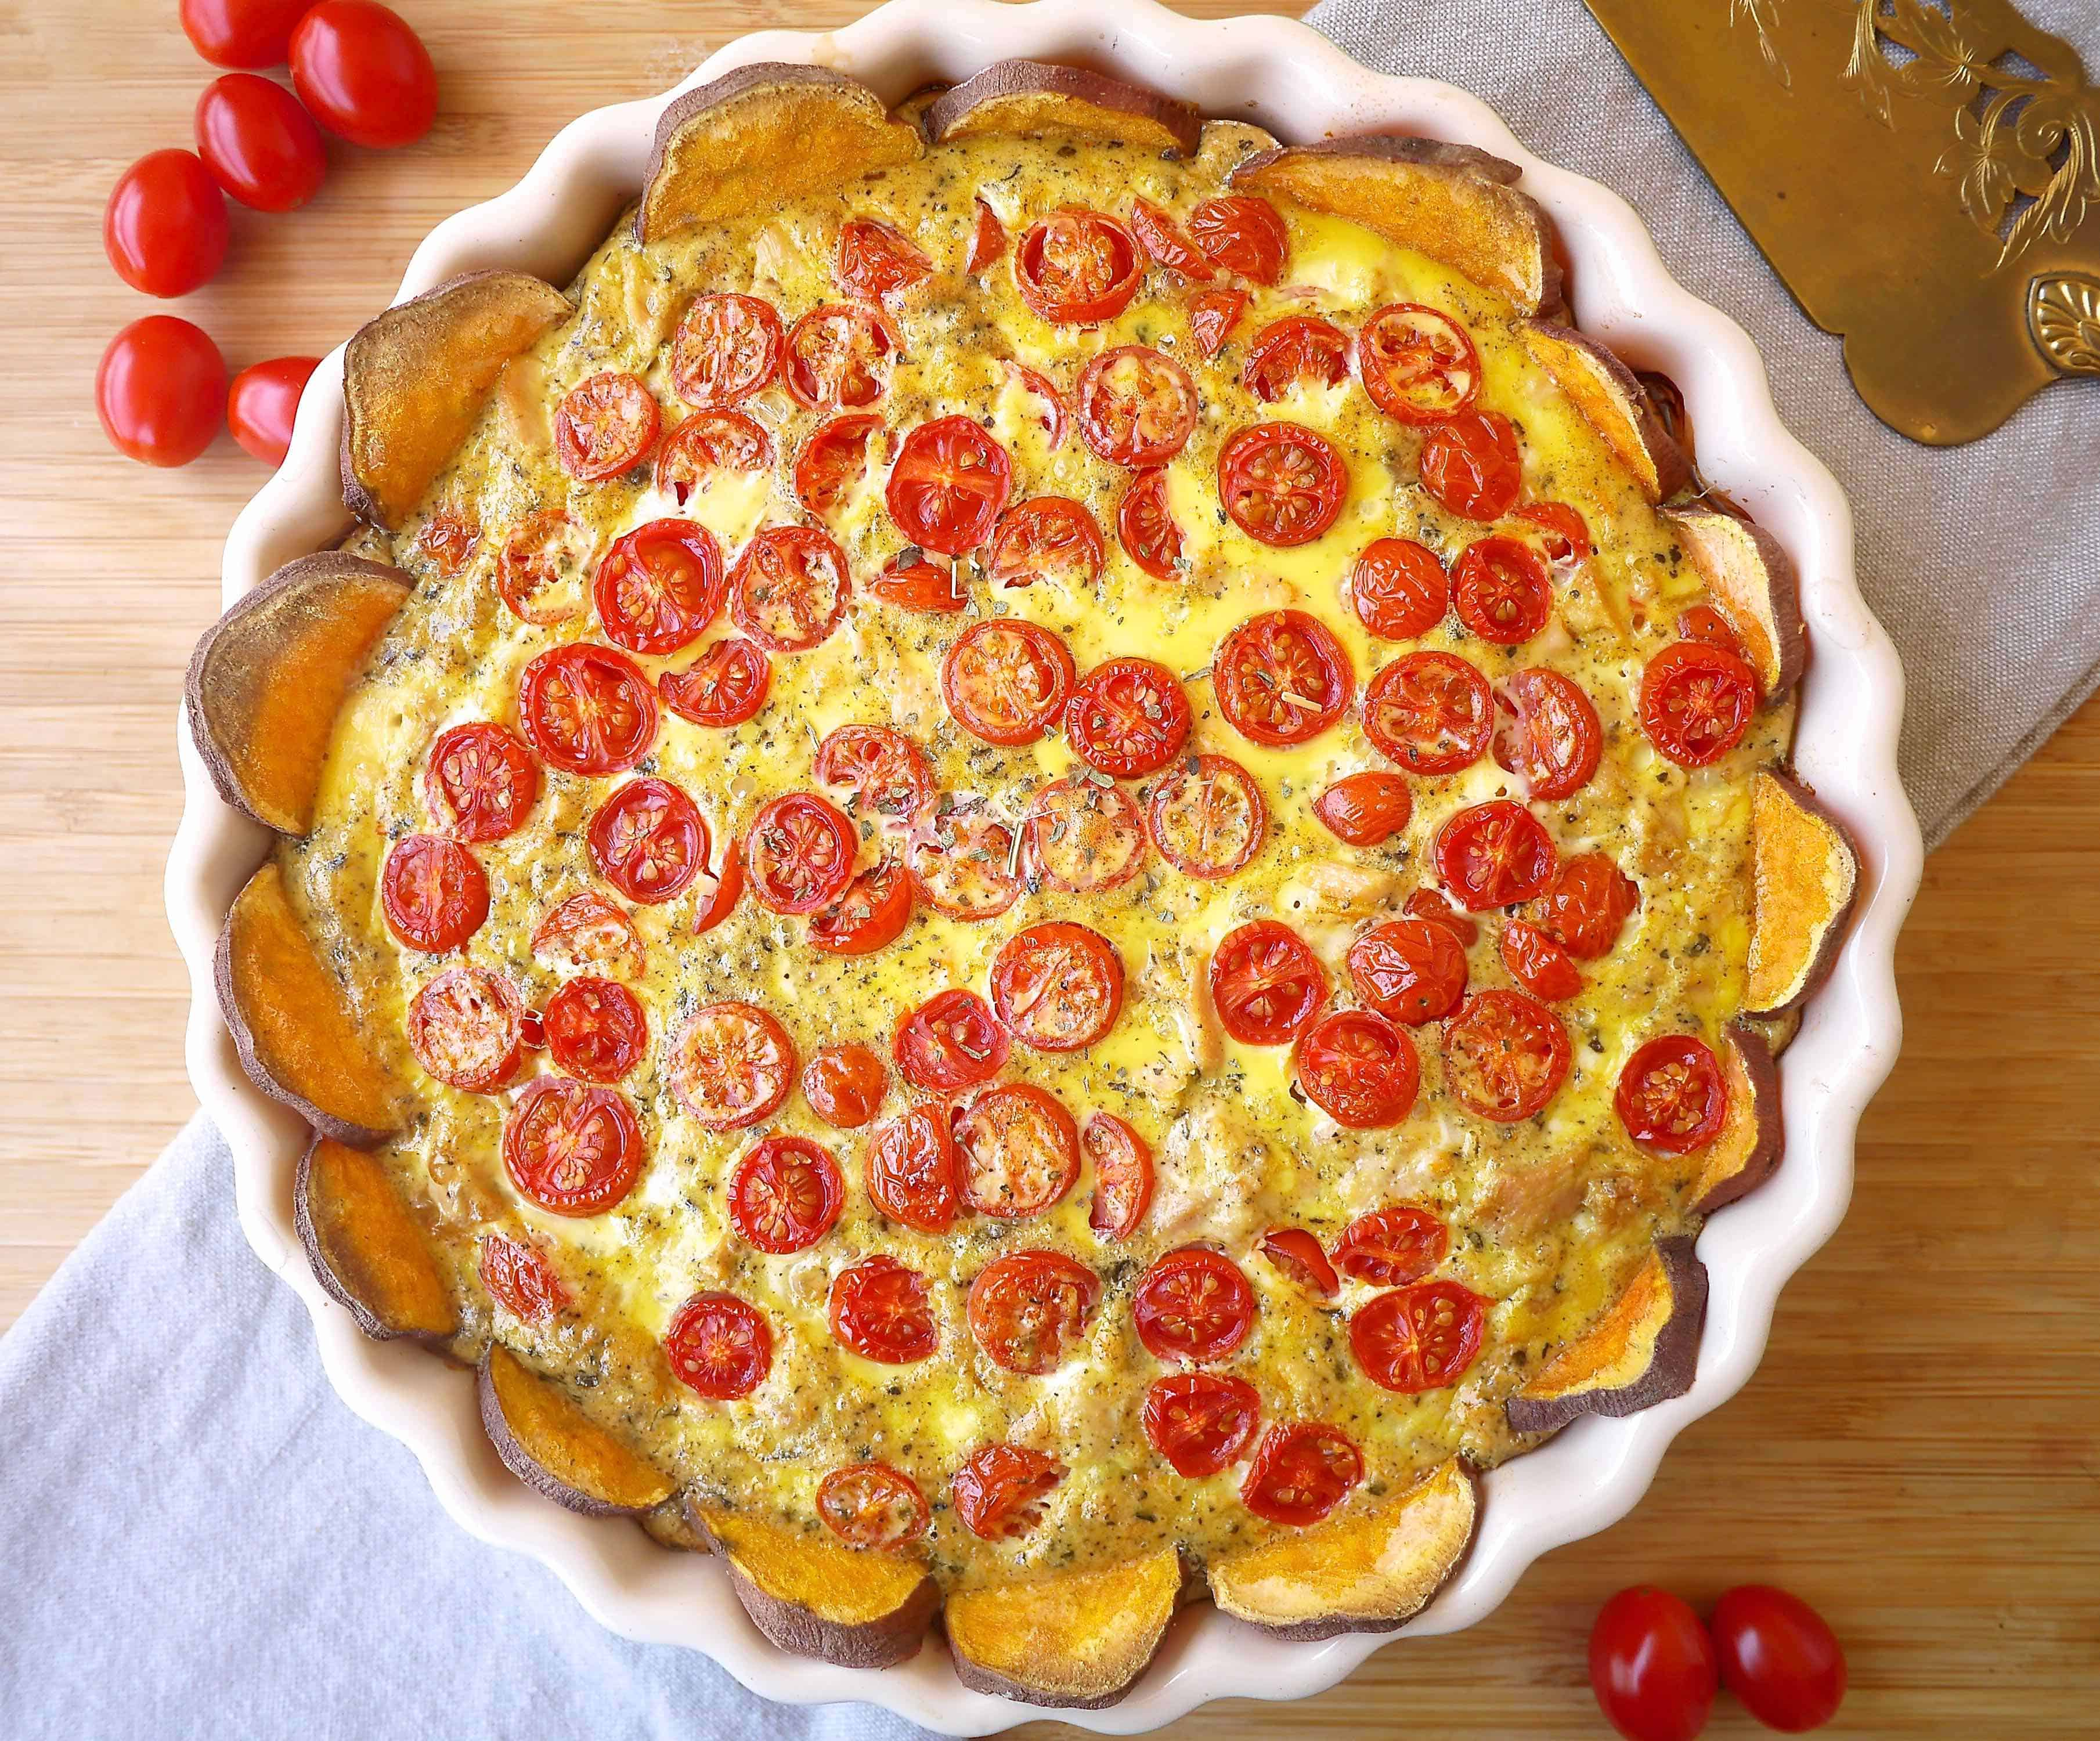 French Tomato, Tuna, & Mustard Quiche-- a refined Paleo quiche made with a sweet potato crust. | Perchance to Cook